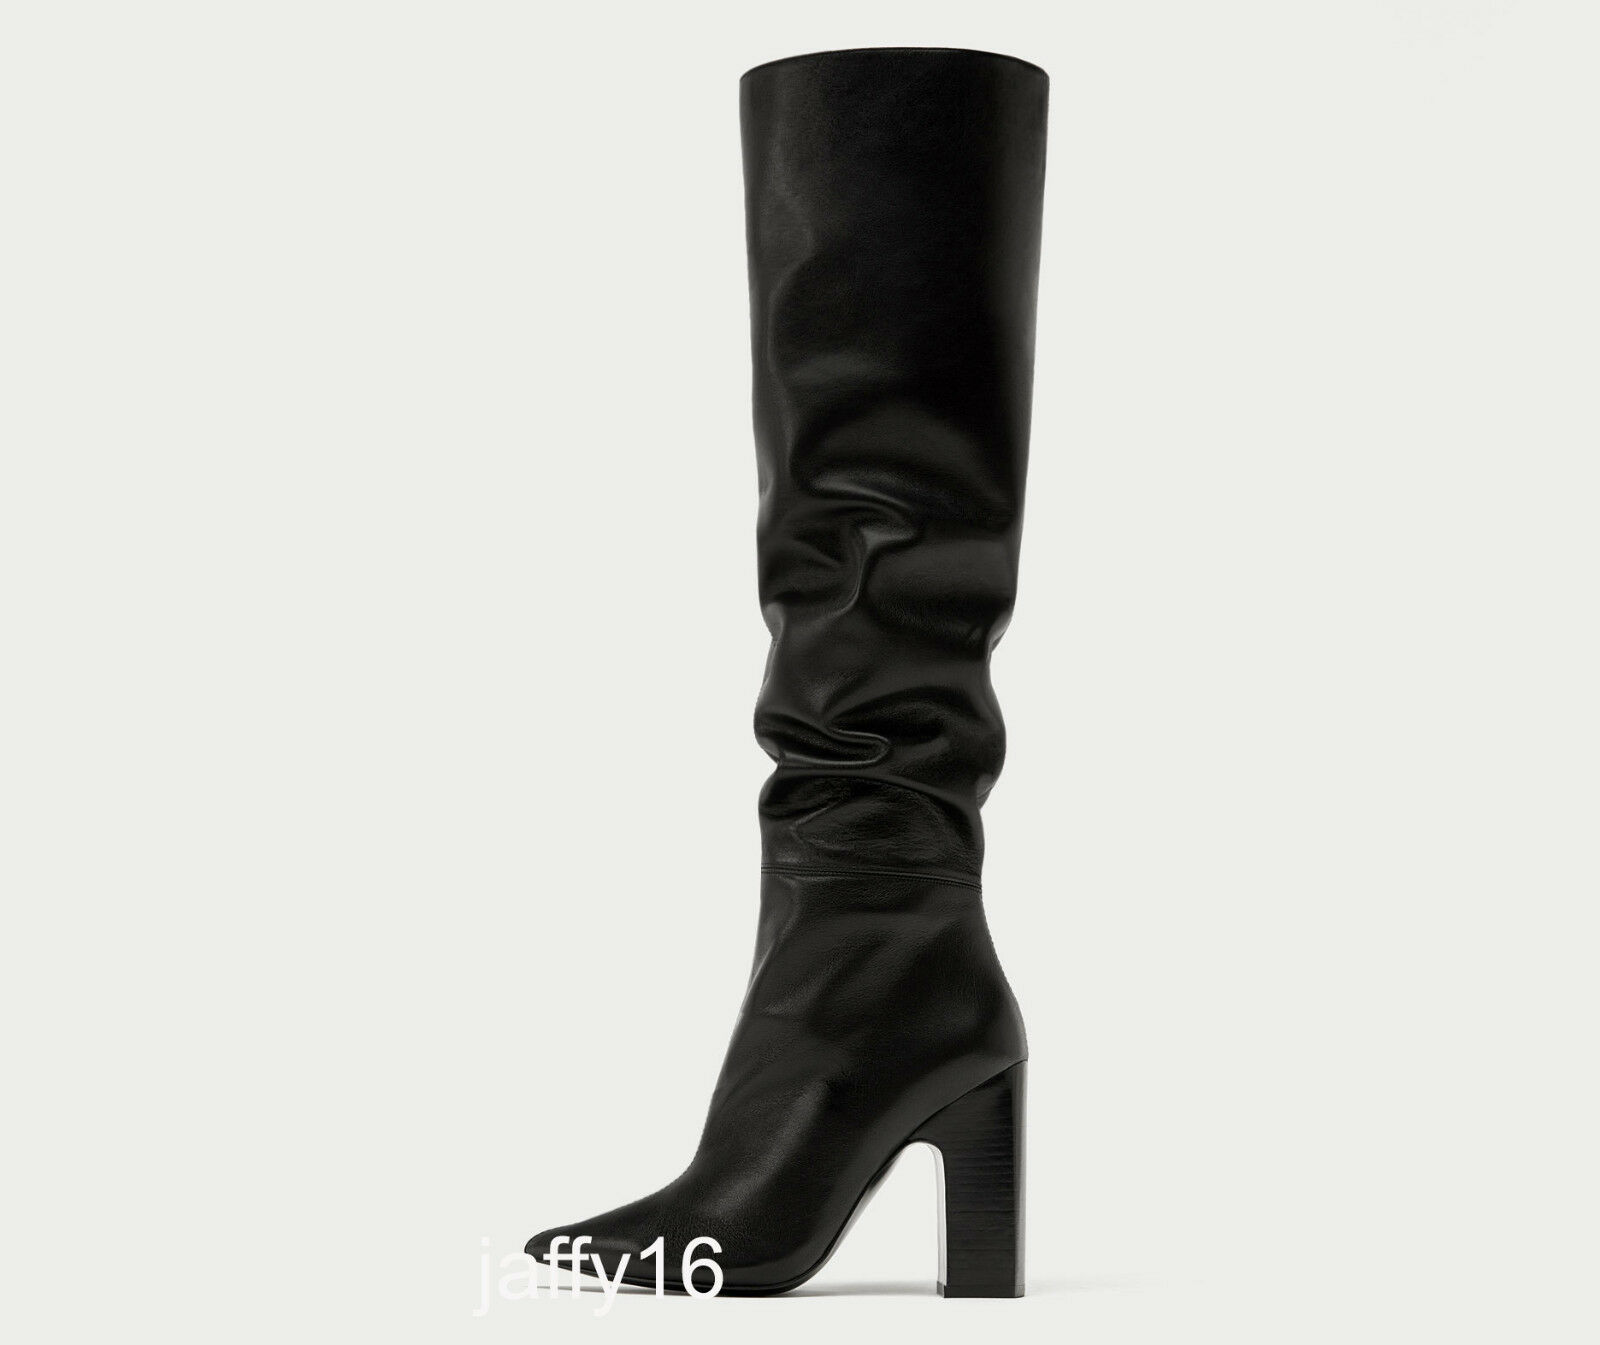 ZARA ZARA ZARA NEW LEATHER HIGH HEEL BOOTS WITH WIDE SLOUCHY LEG KNEE BLACK 36-41 5017 201 aaf626